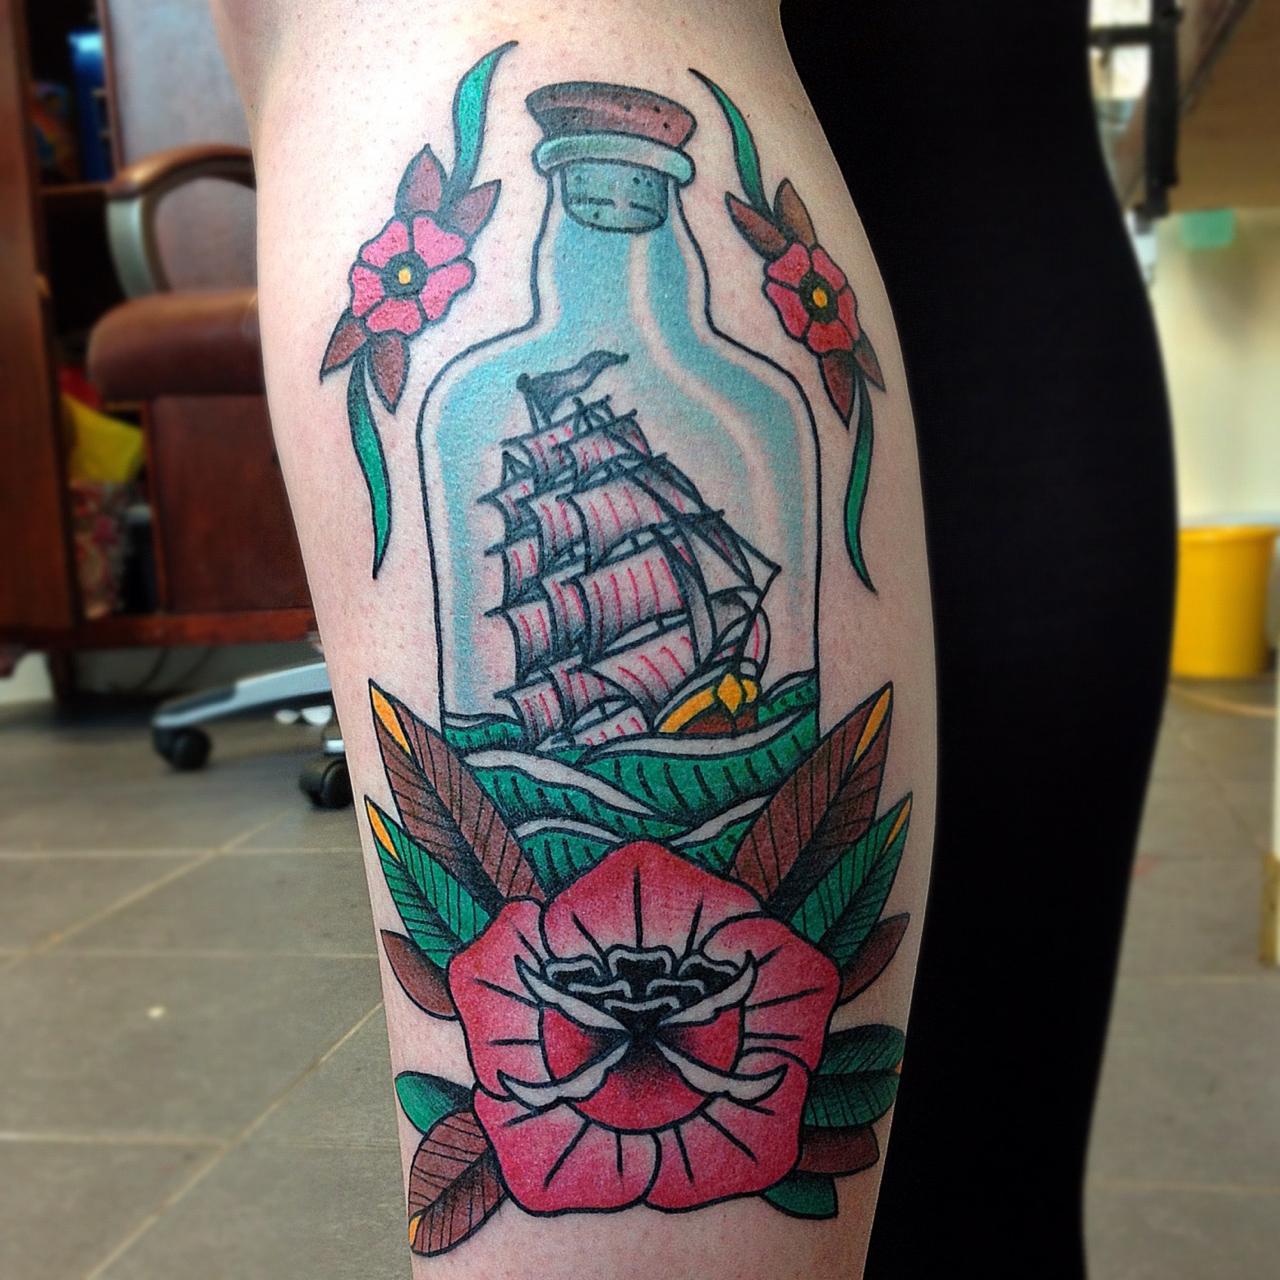 ship in a bottle best tattoo design ideas. Black Bedroom Furniture Sets. Home Design Ideas